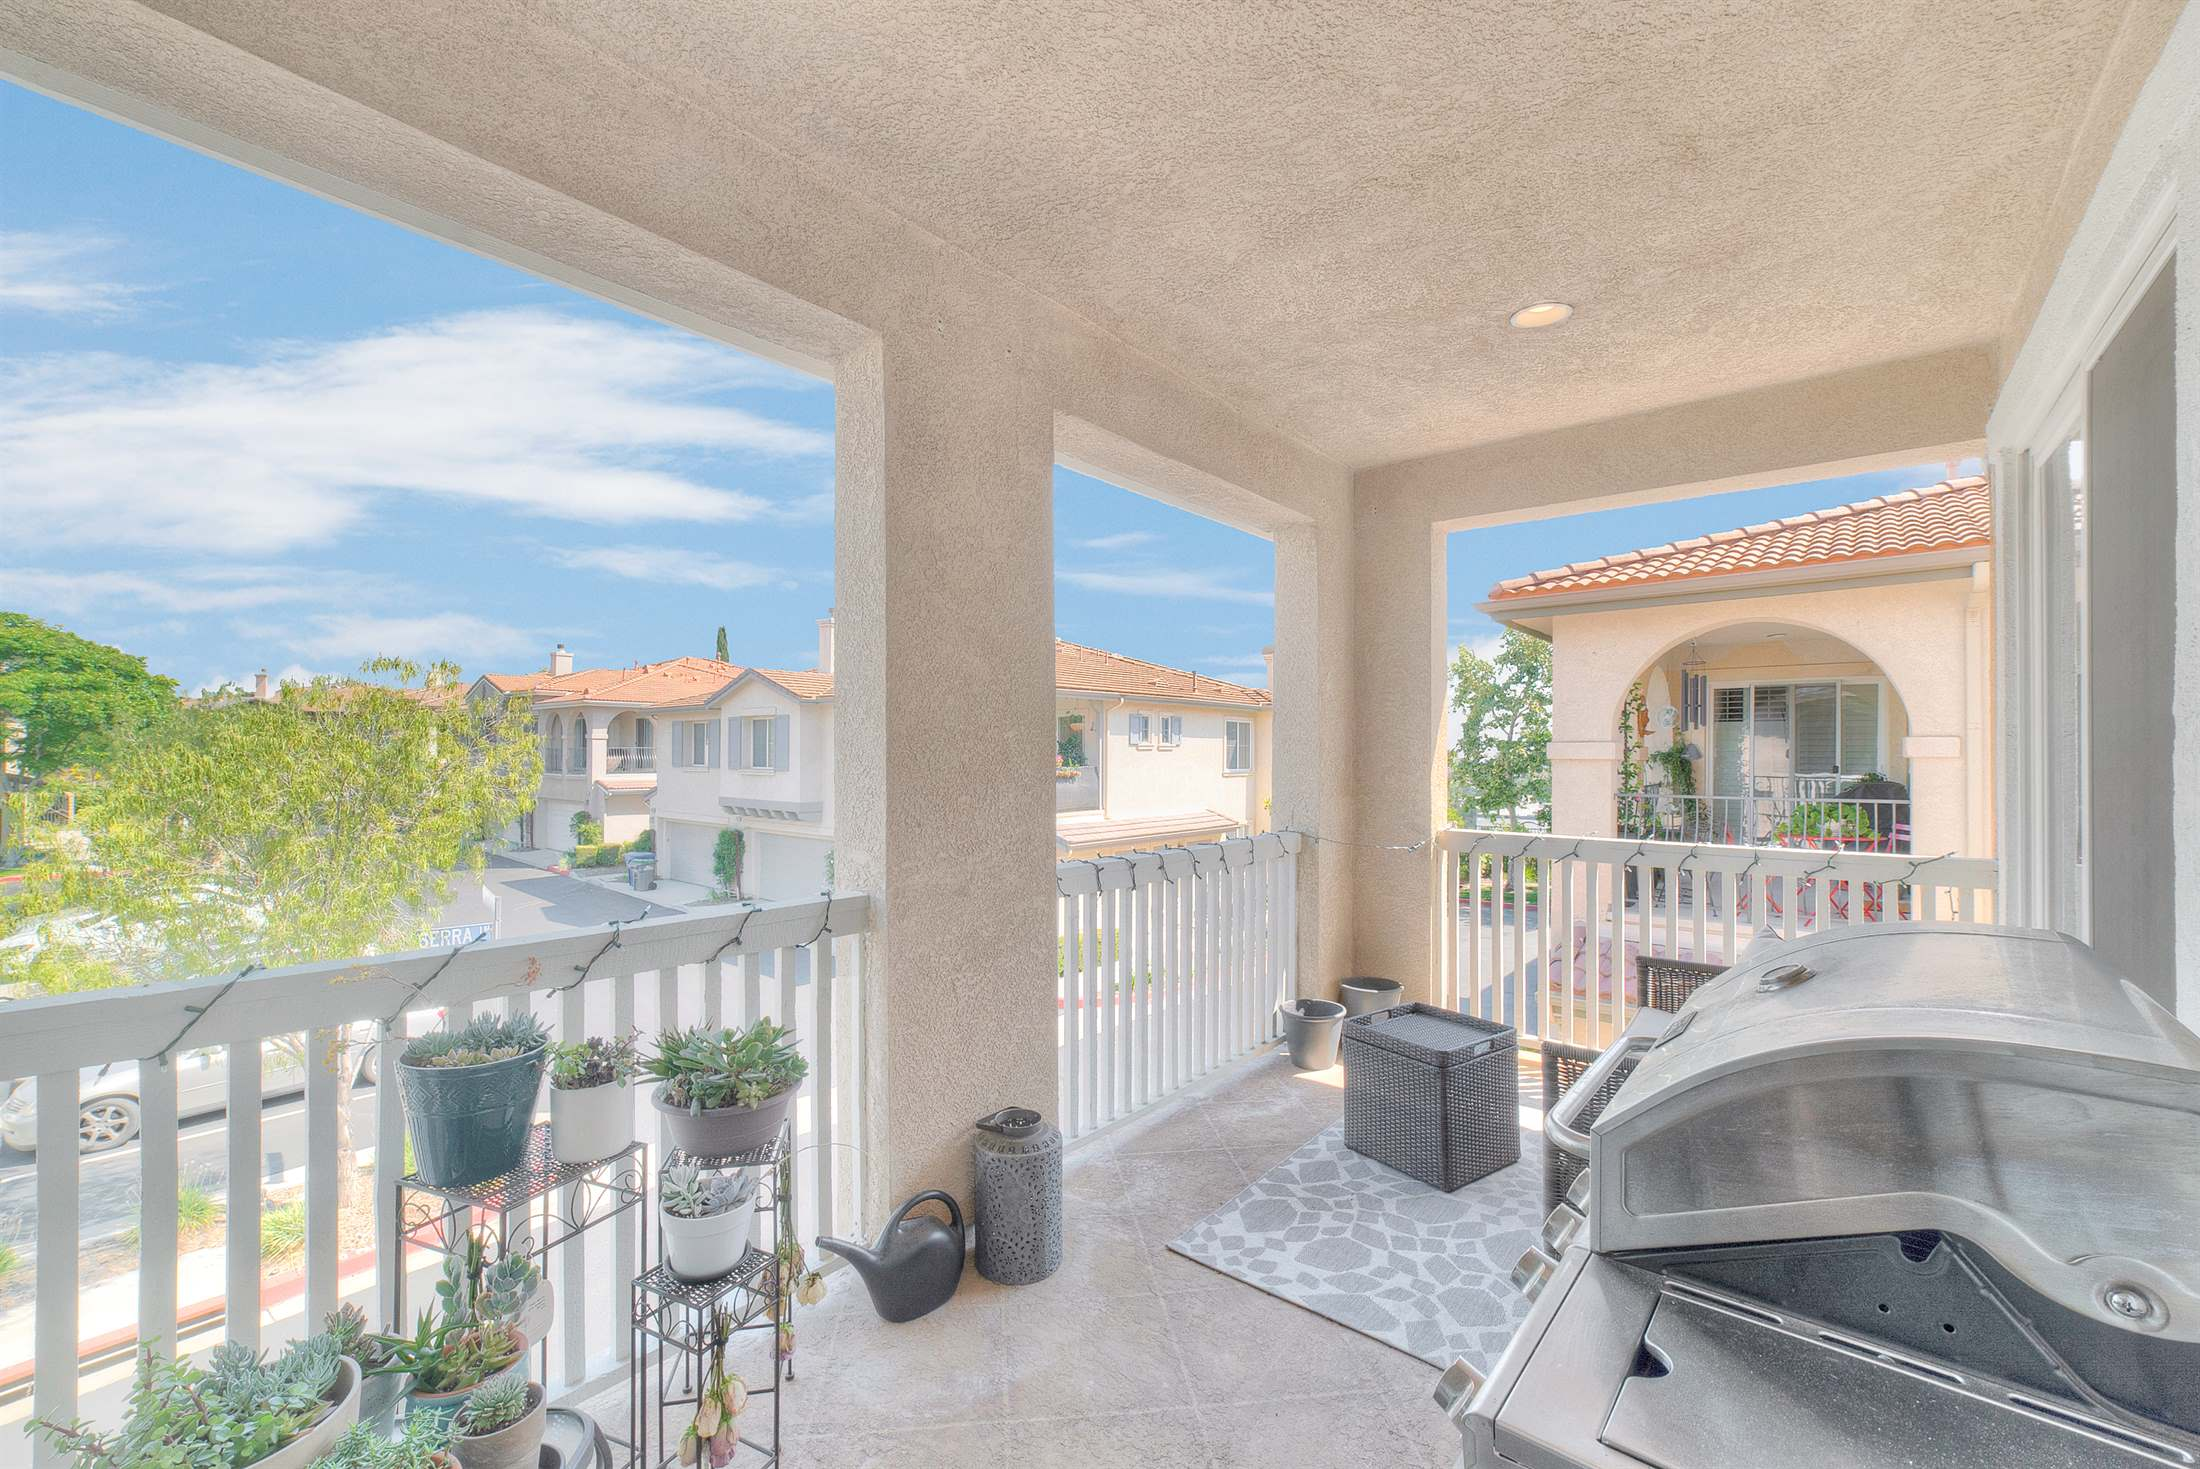 28017 Serra Ln, Valencia, CA 91355